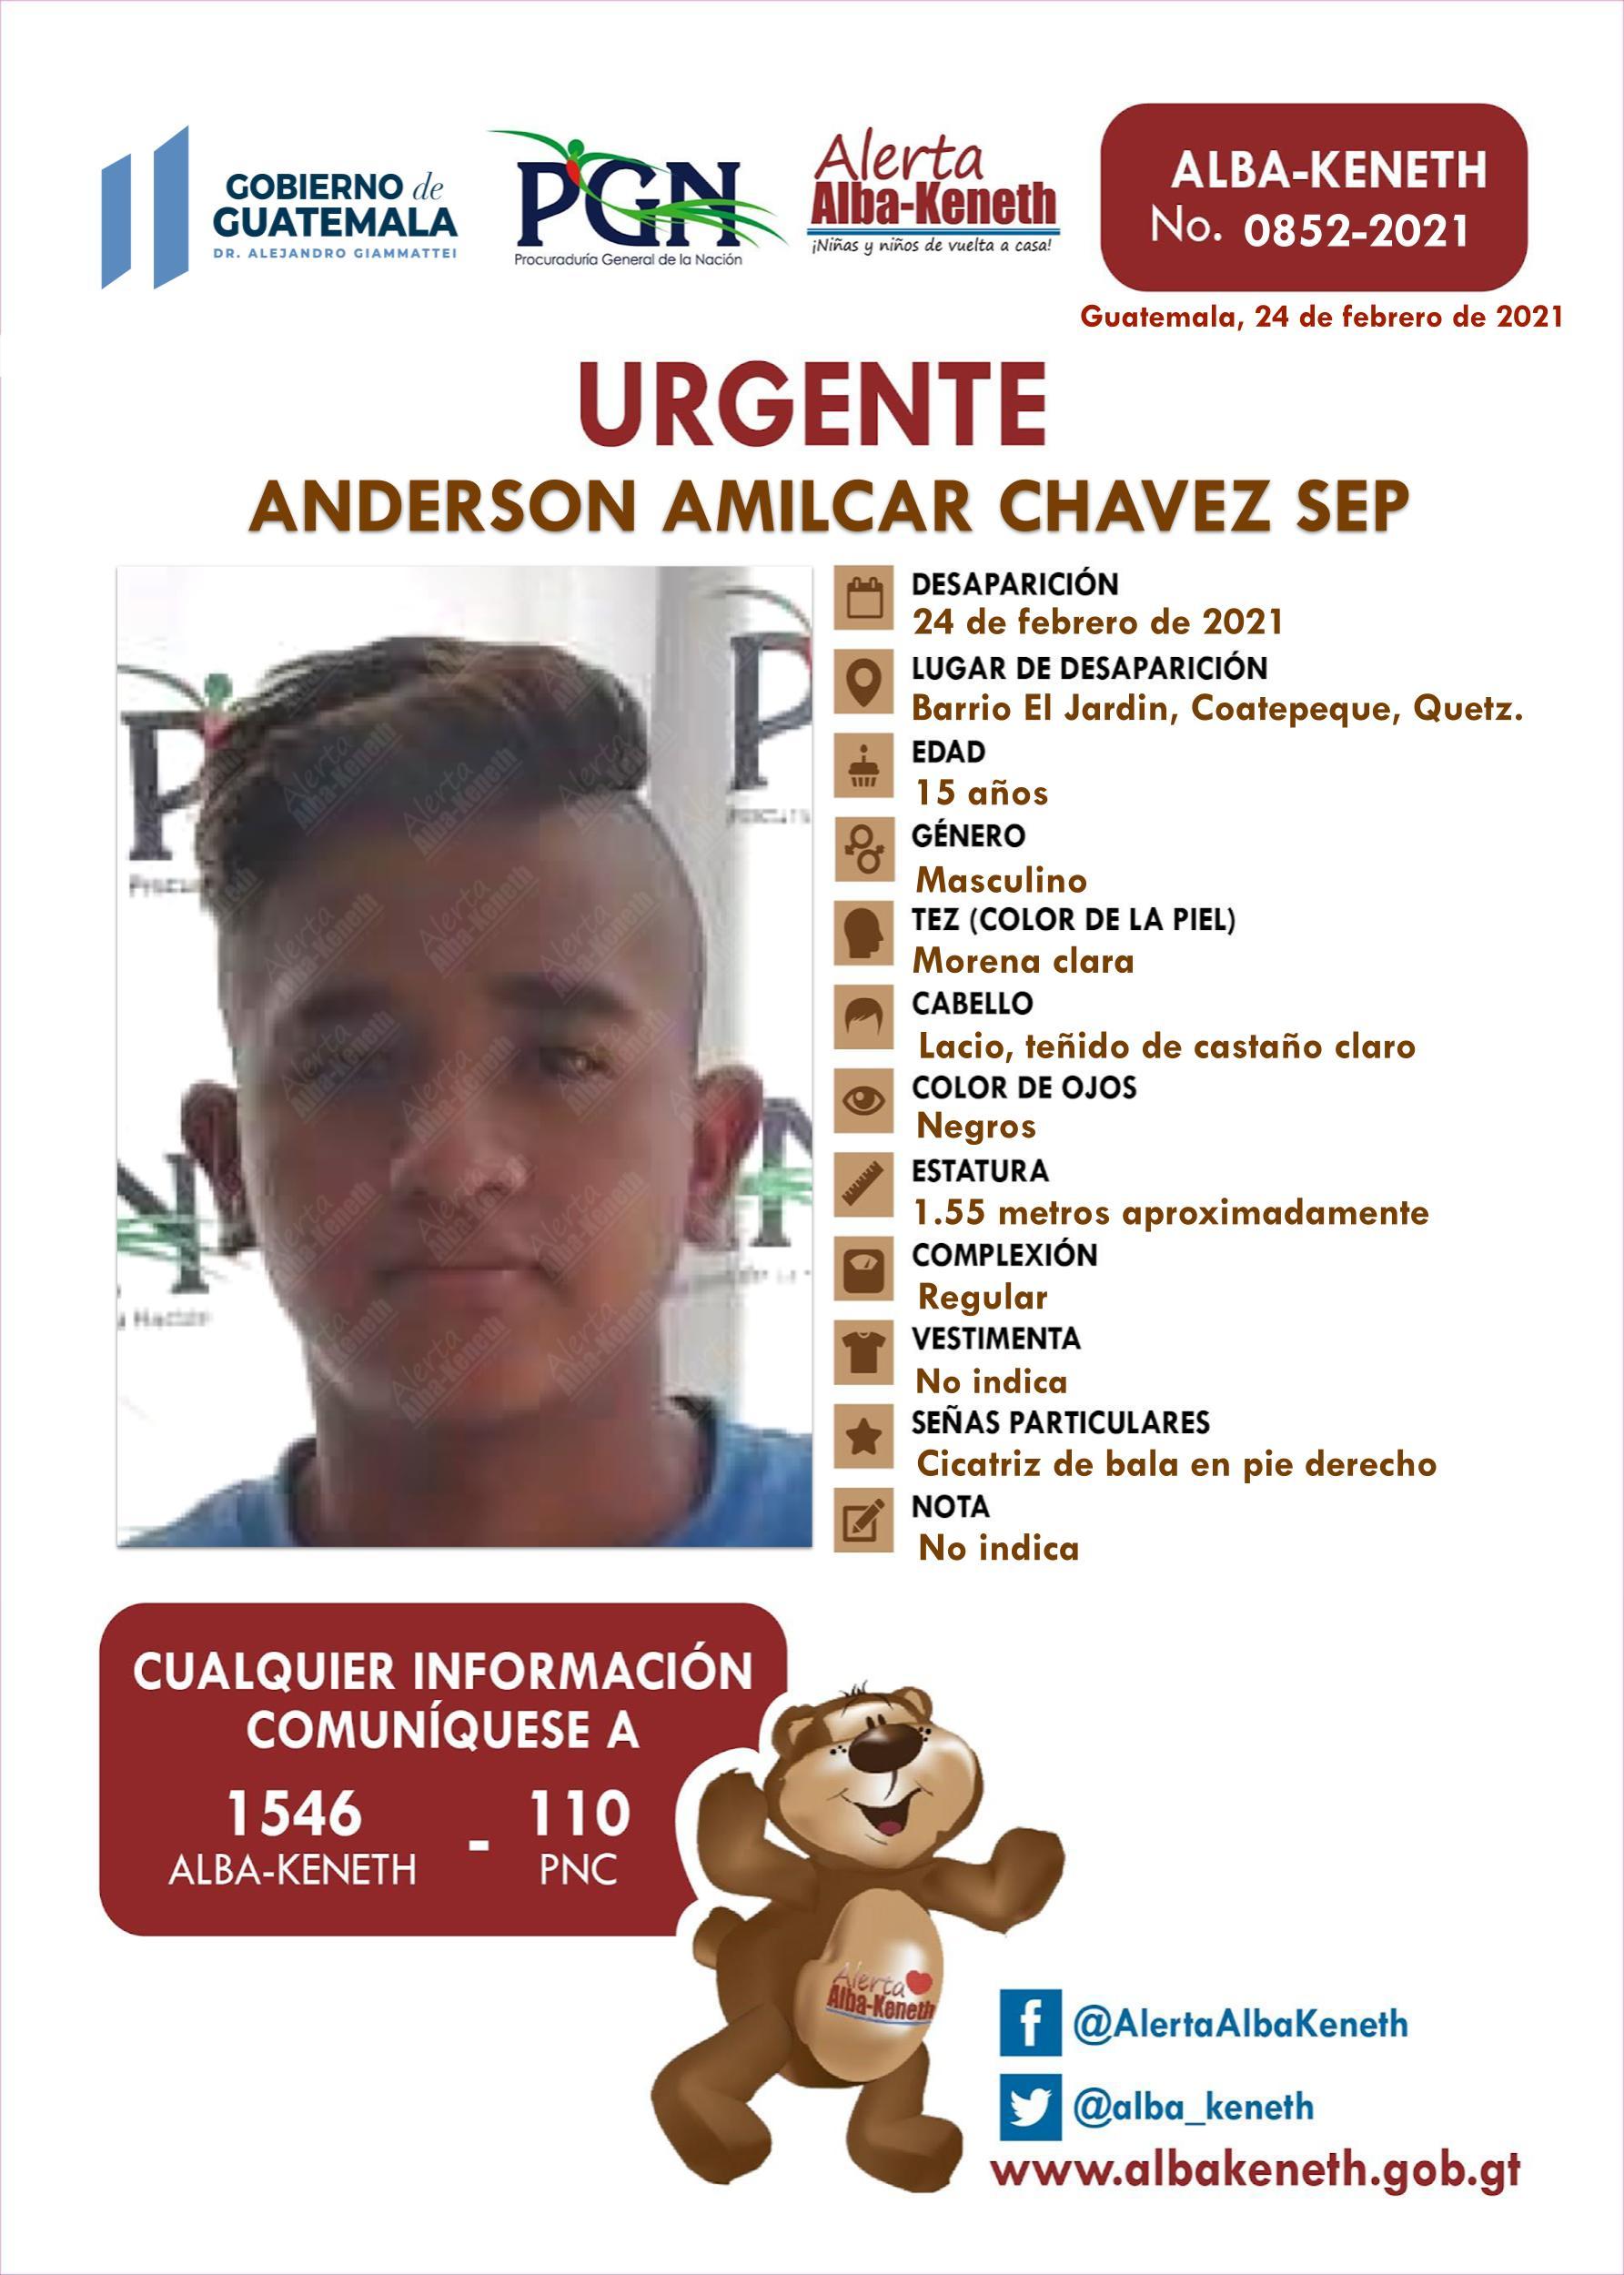 Anderson Amilcar Chavez Sep